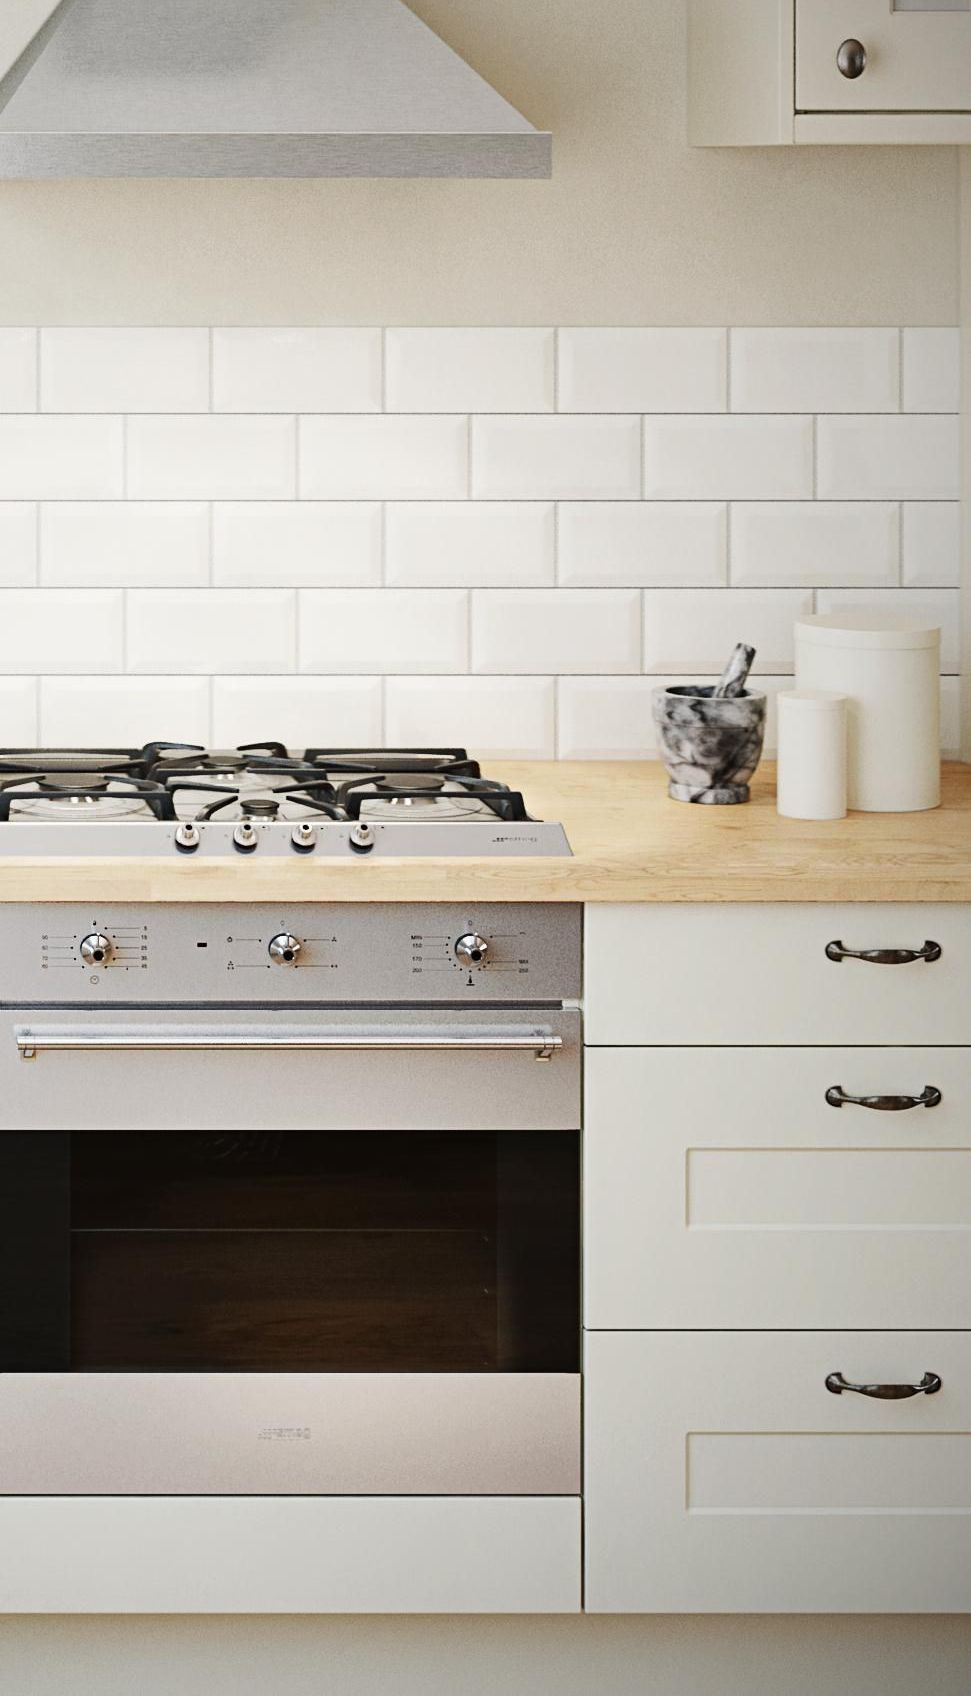 Country Kitchen Design Ideas Ideas Amp Advice DIY At BampQ